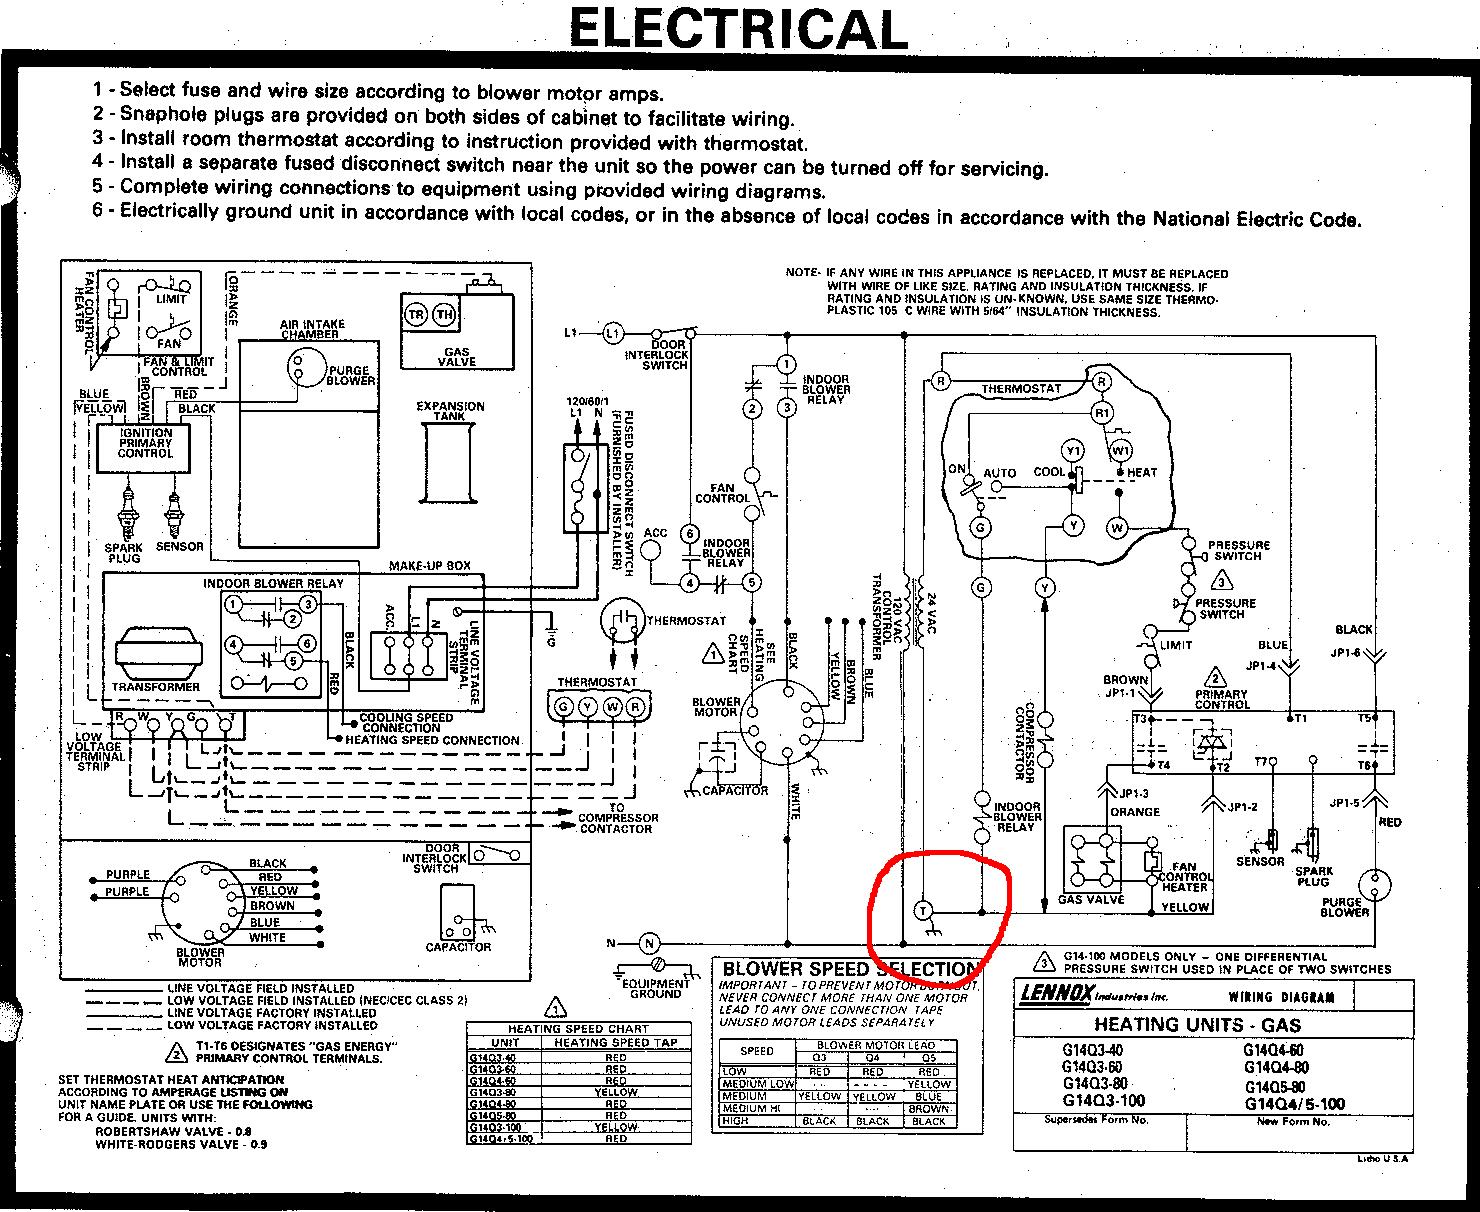 Old Lennox Furnace Wiring Diagram